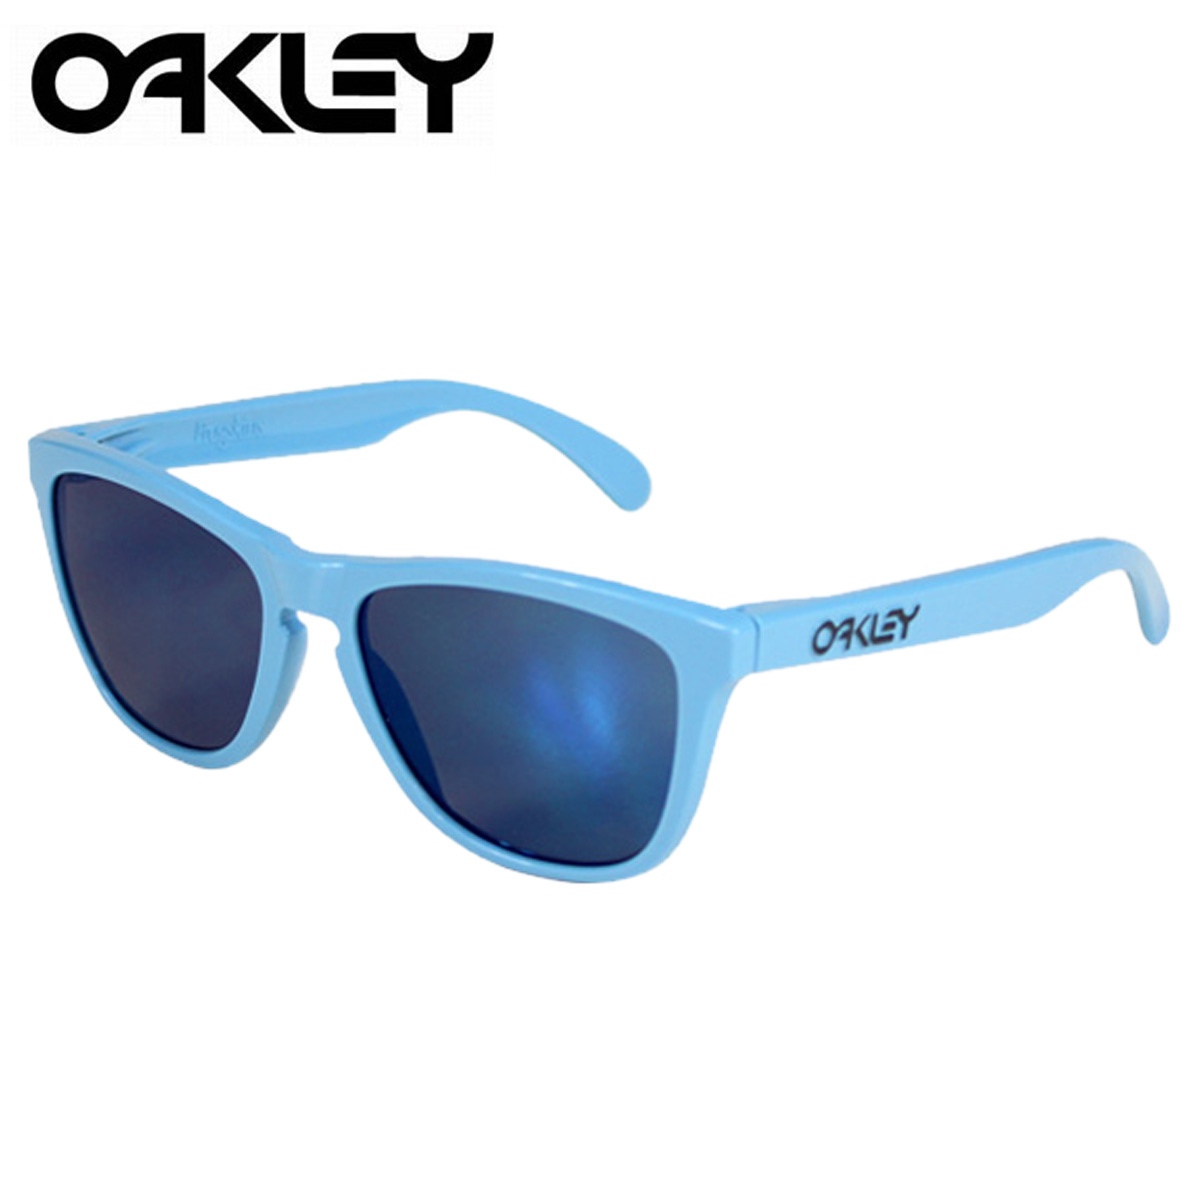 36e1d644b1 Oakley   ☆ FROGSKINS (SPECIAL EDITION HERITAGE FROGSKINS) ☆ Sunglasses    STYLE  9013-36. Visible light transmittance  10% UV transmittance :1.0%  below